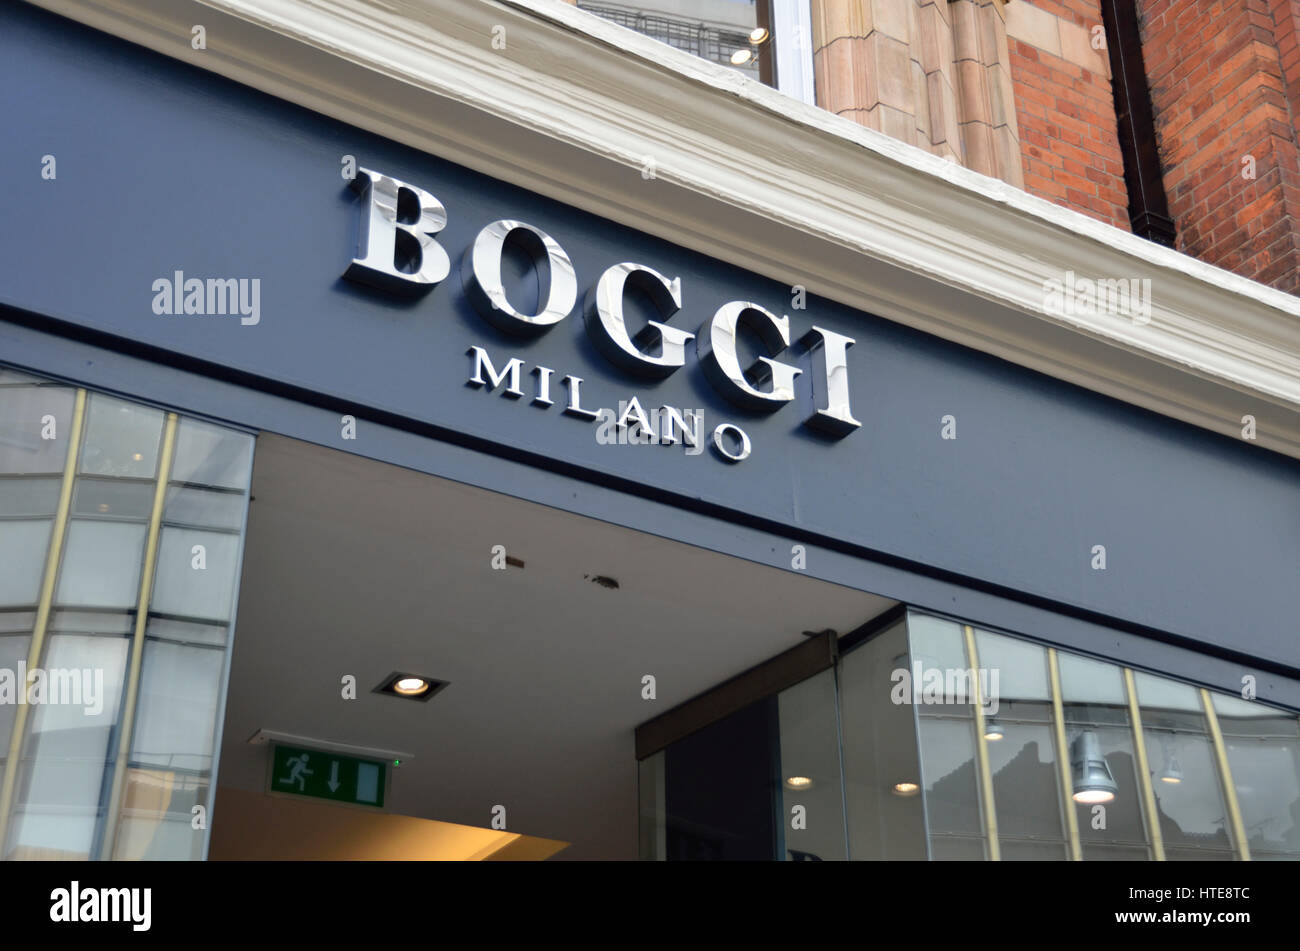 Boggi Milano meanswear shop in Sloane Square, Chelsea, London, UK - Stock Image